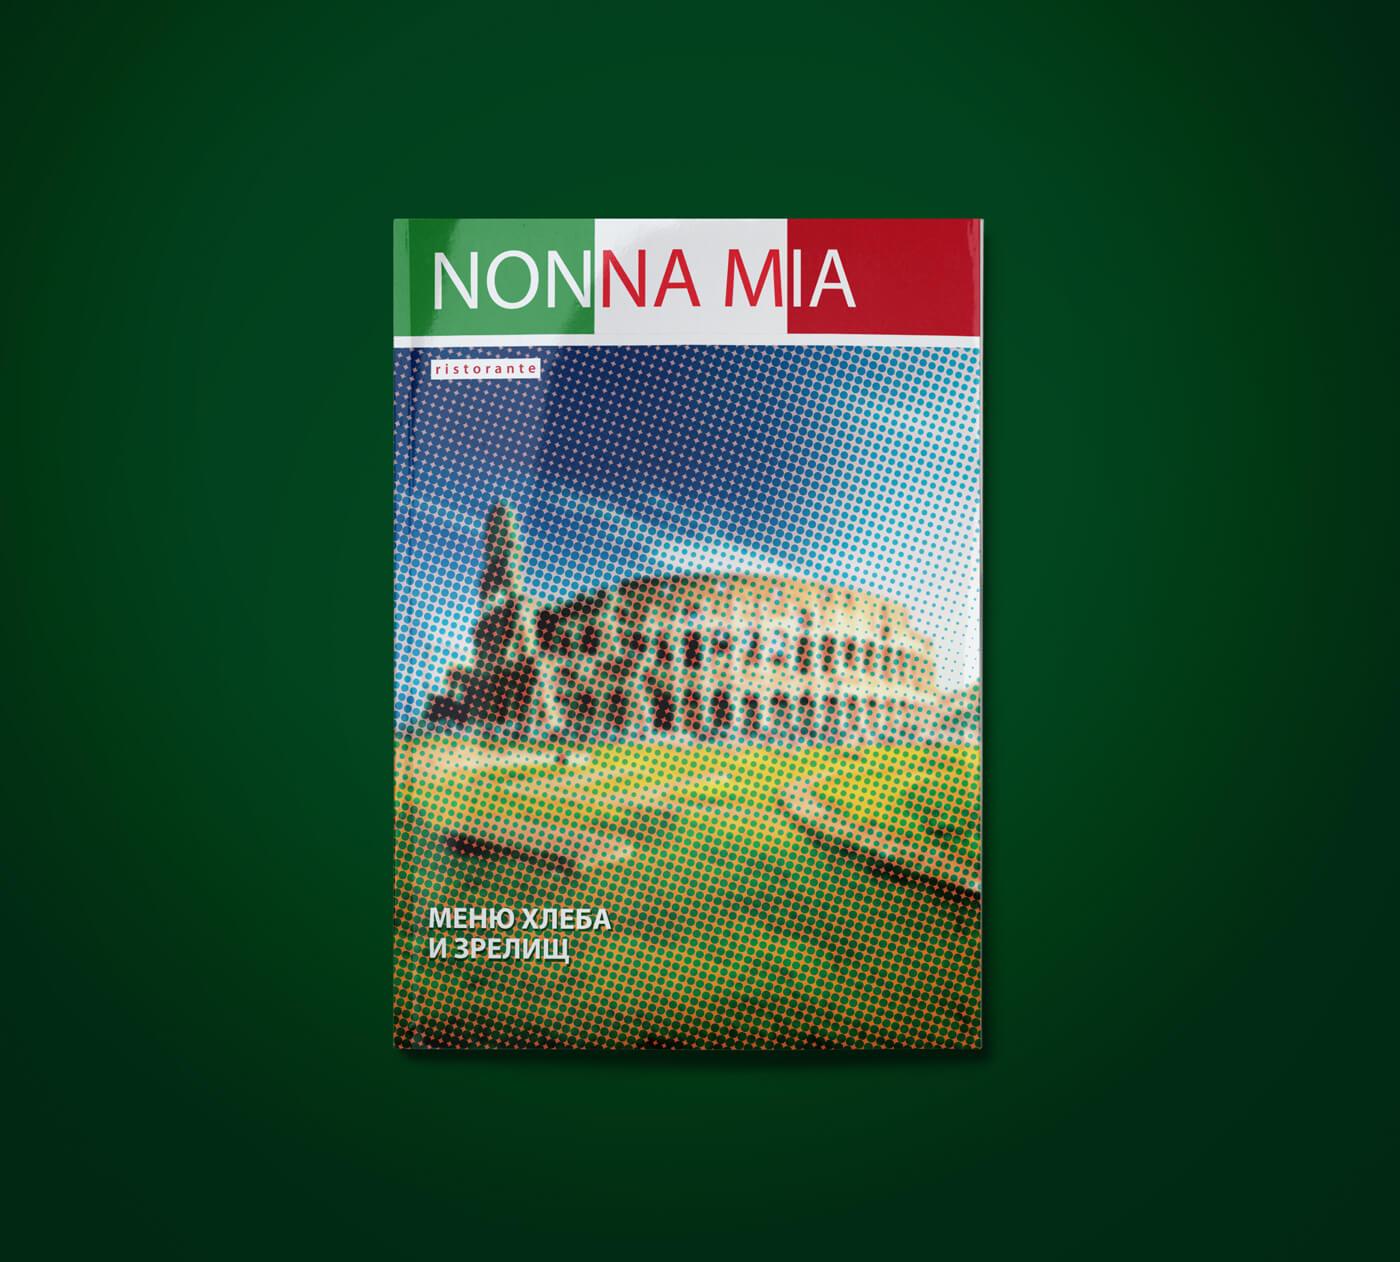 Дизайн обложки – меню хлеба и зрелищ – Итальянский ресторан «Нонна Миа»